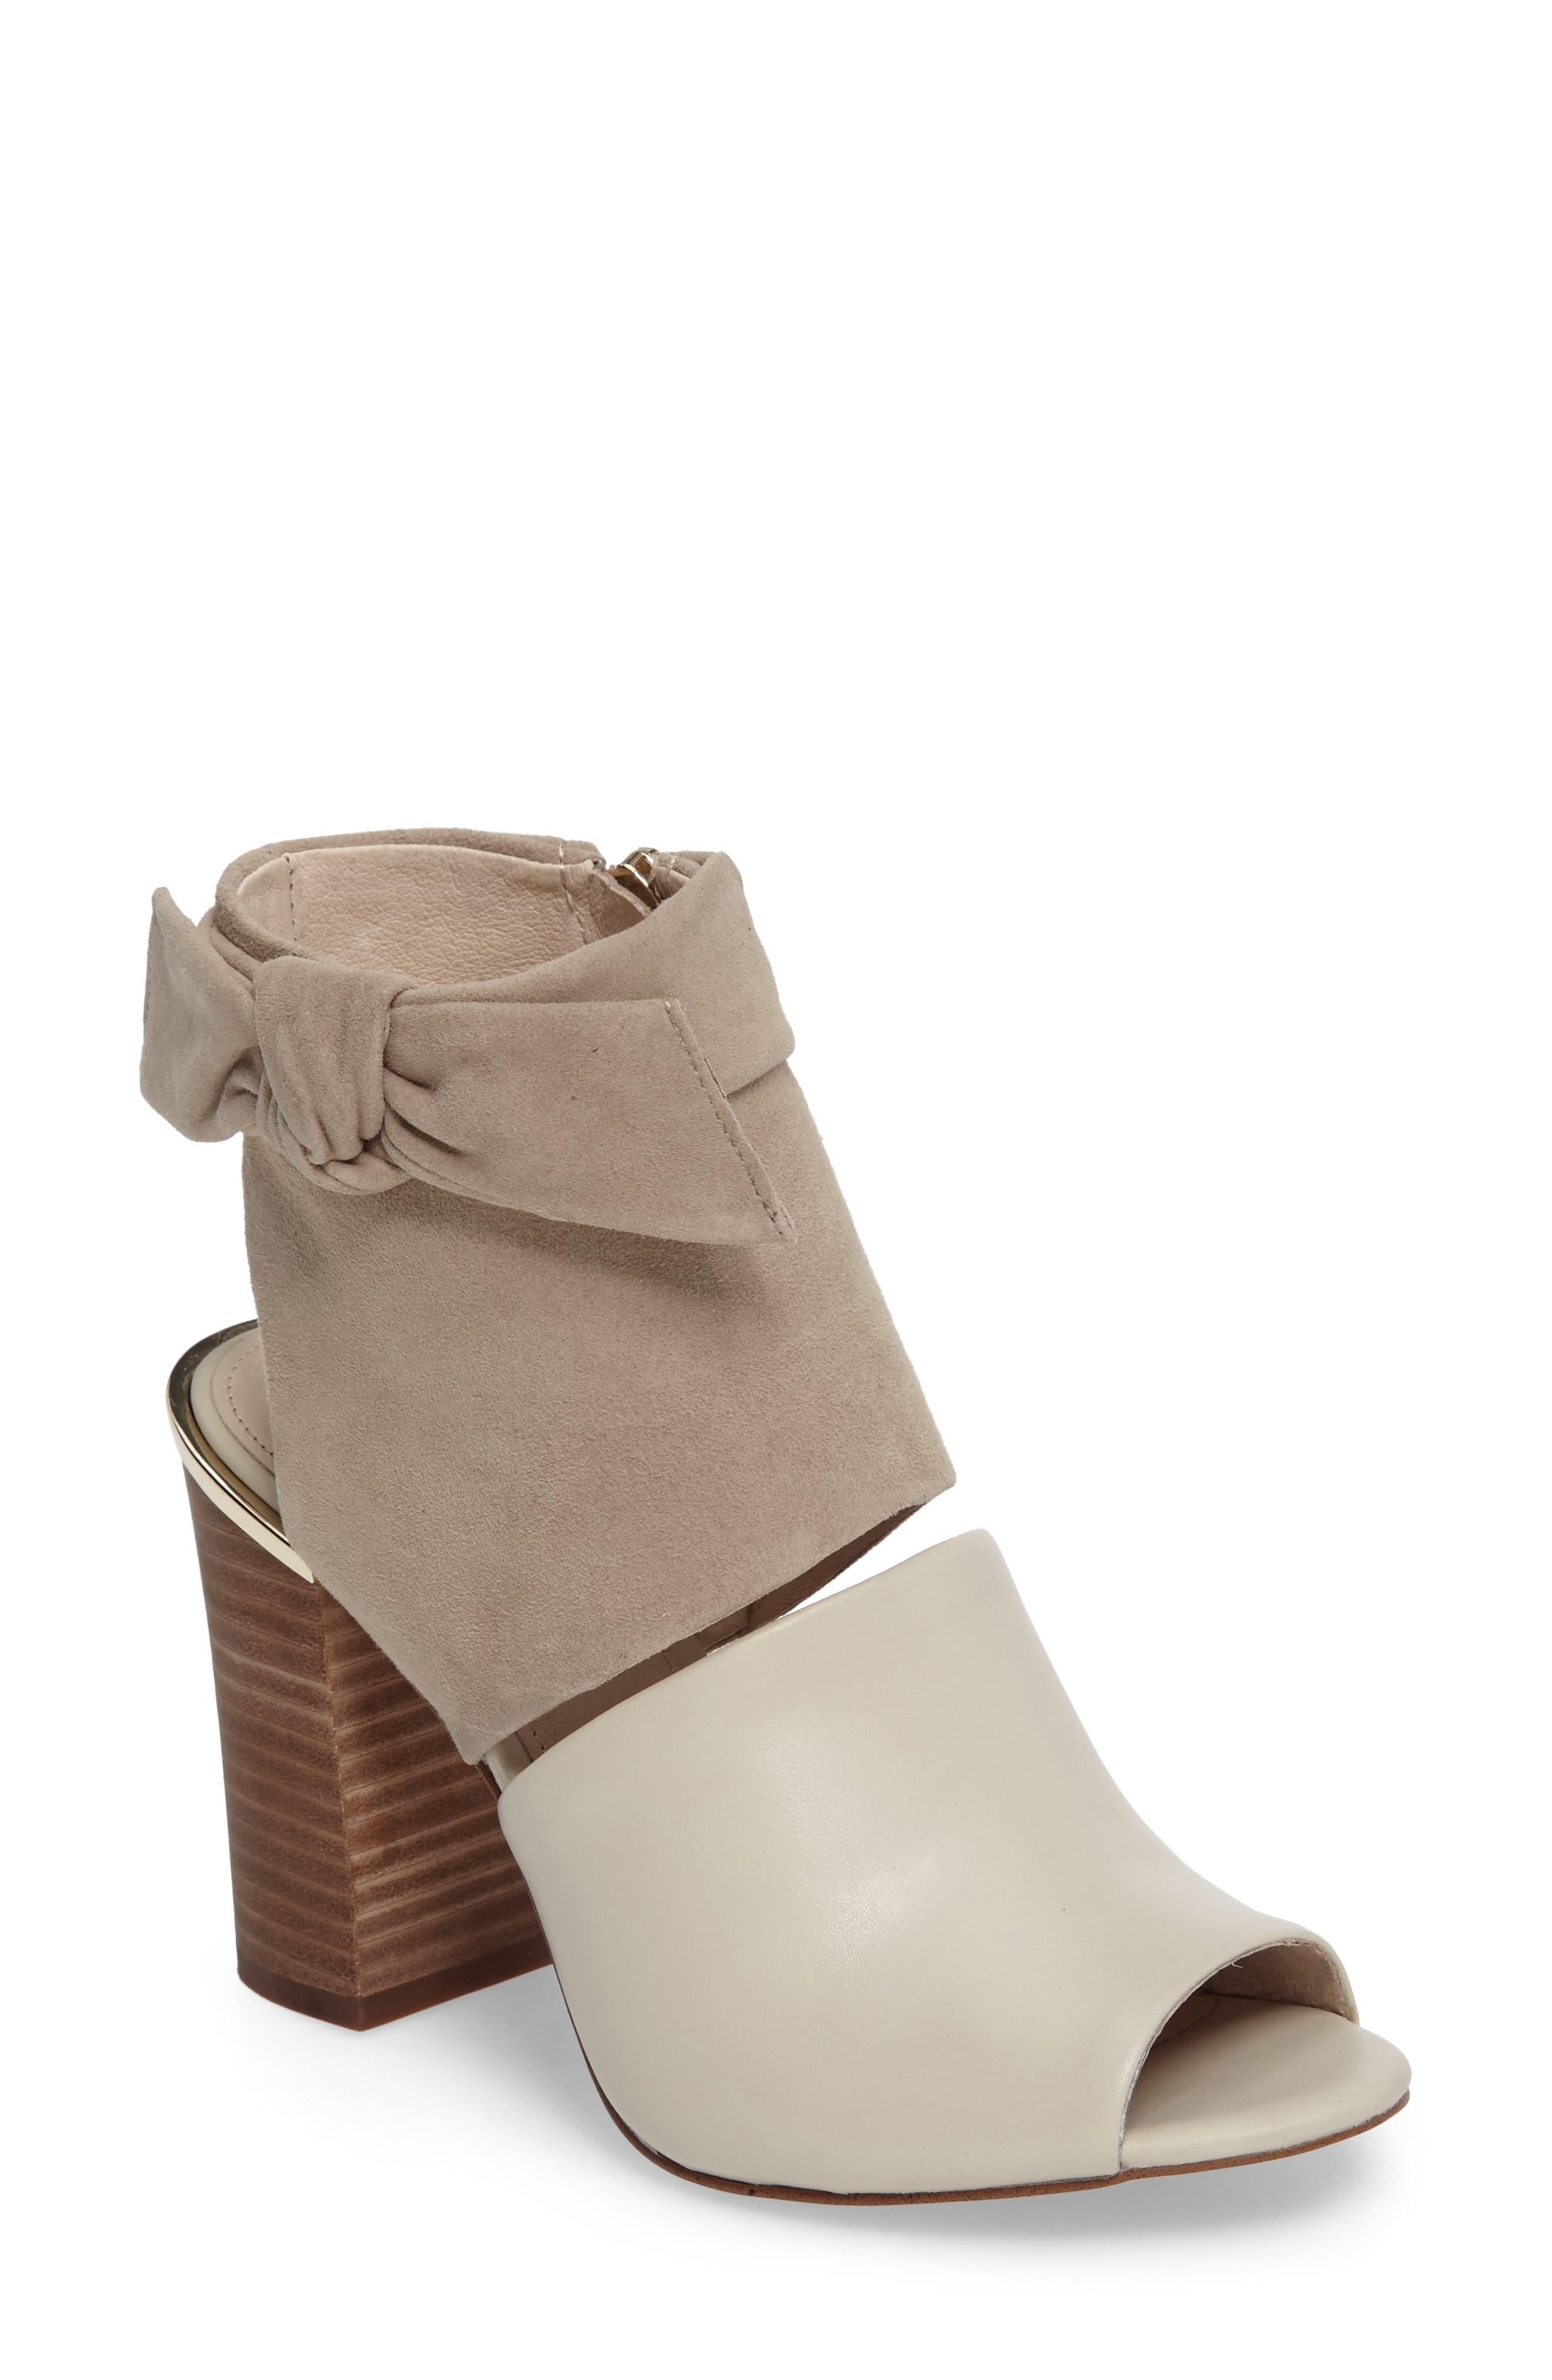 Louise et Cit Katlin Block Heel Sandal (Women)